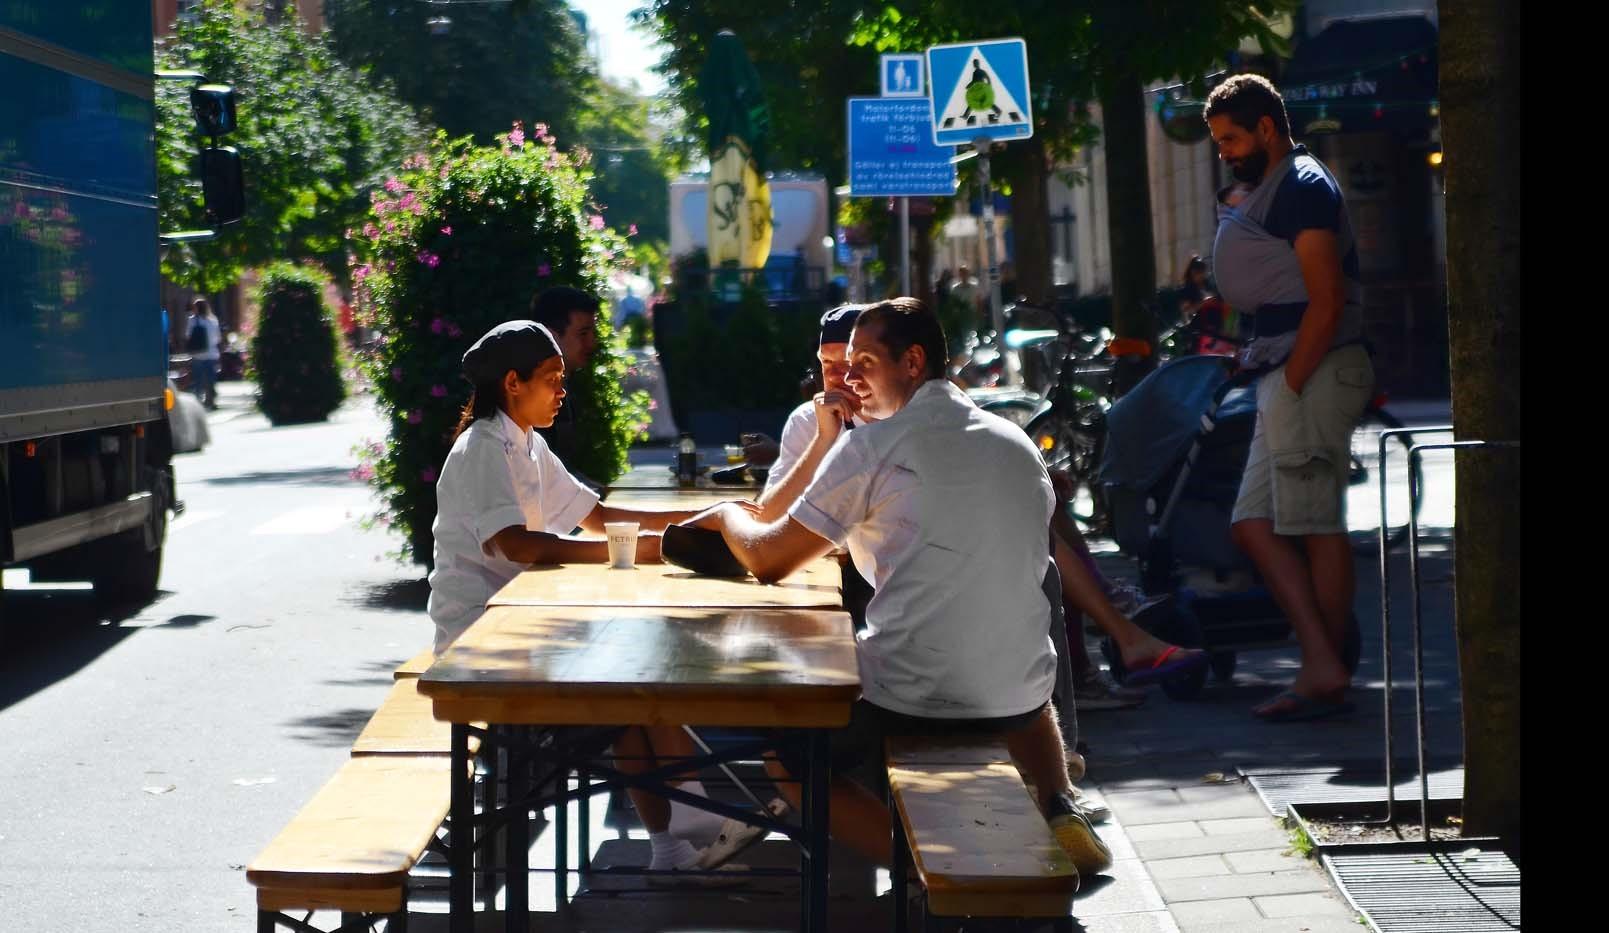 Fatburs Kvarngata 28 - Swedenborgsgatan uteserveringar sommartid